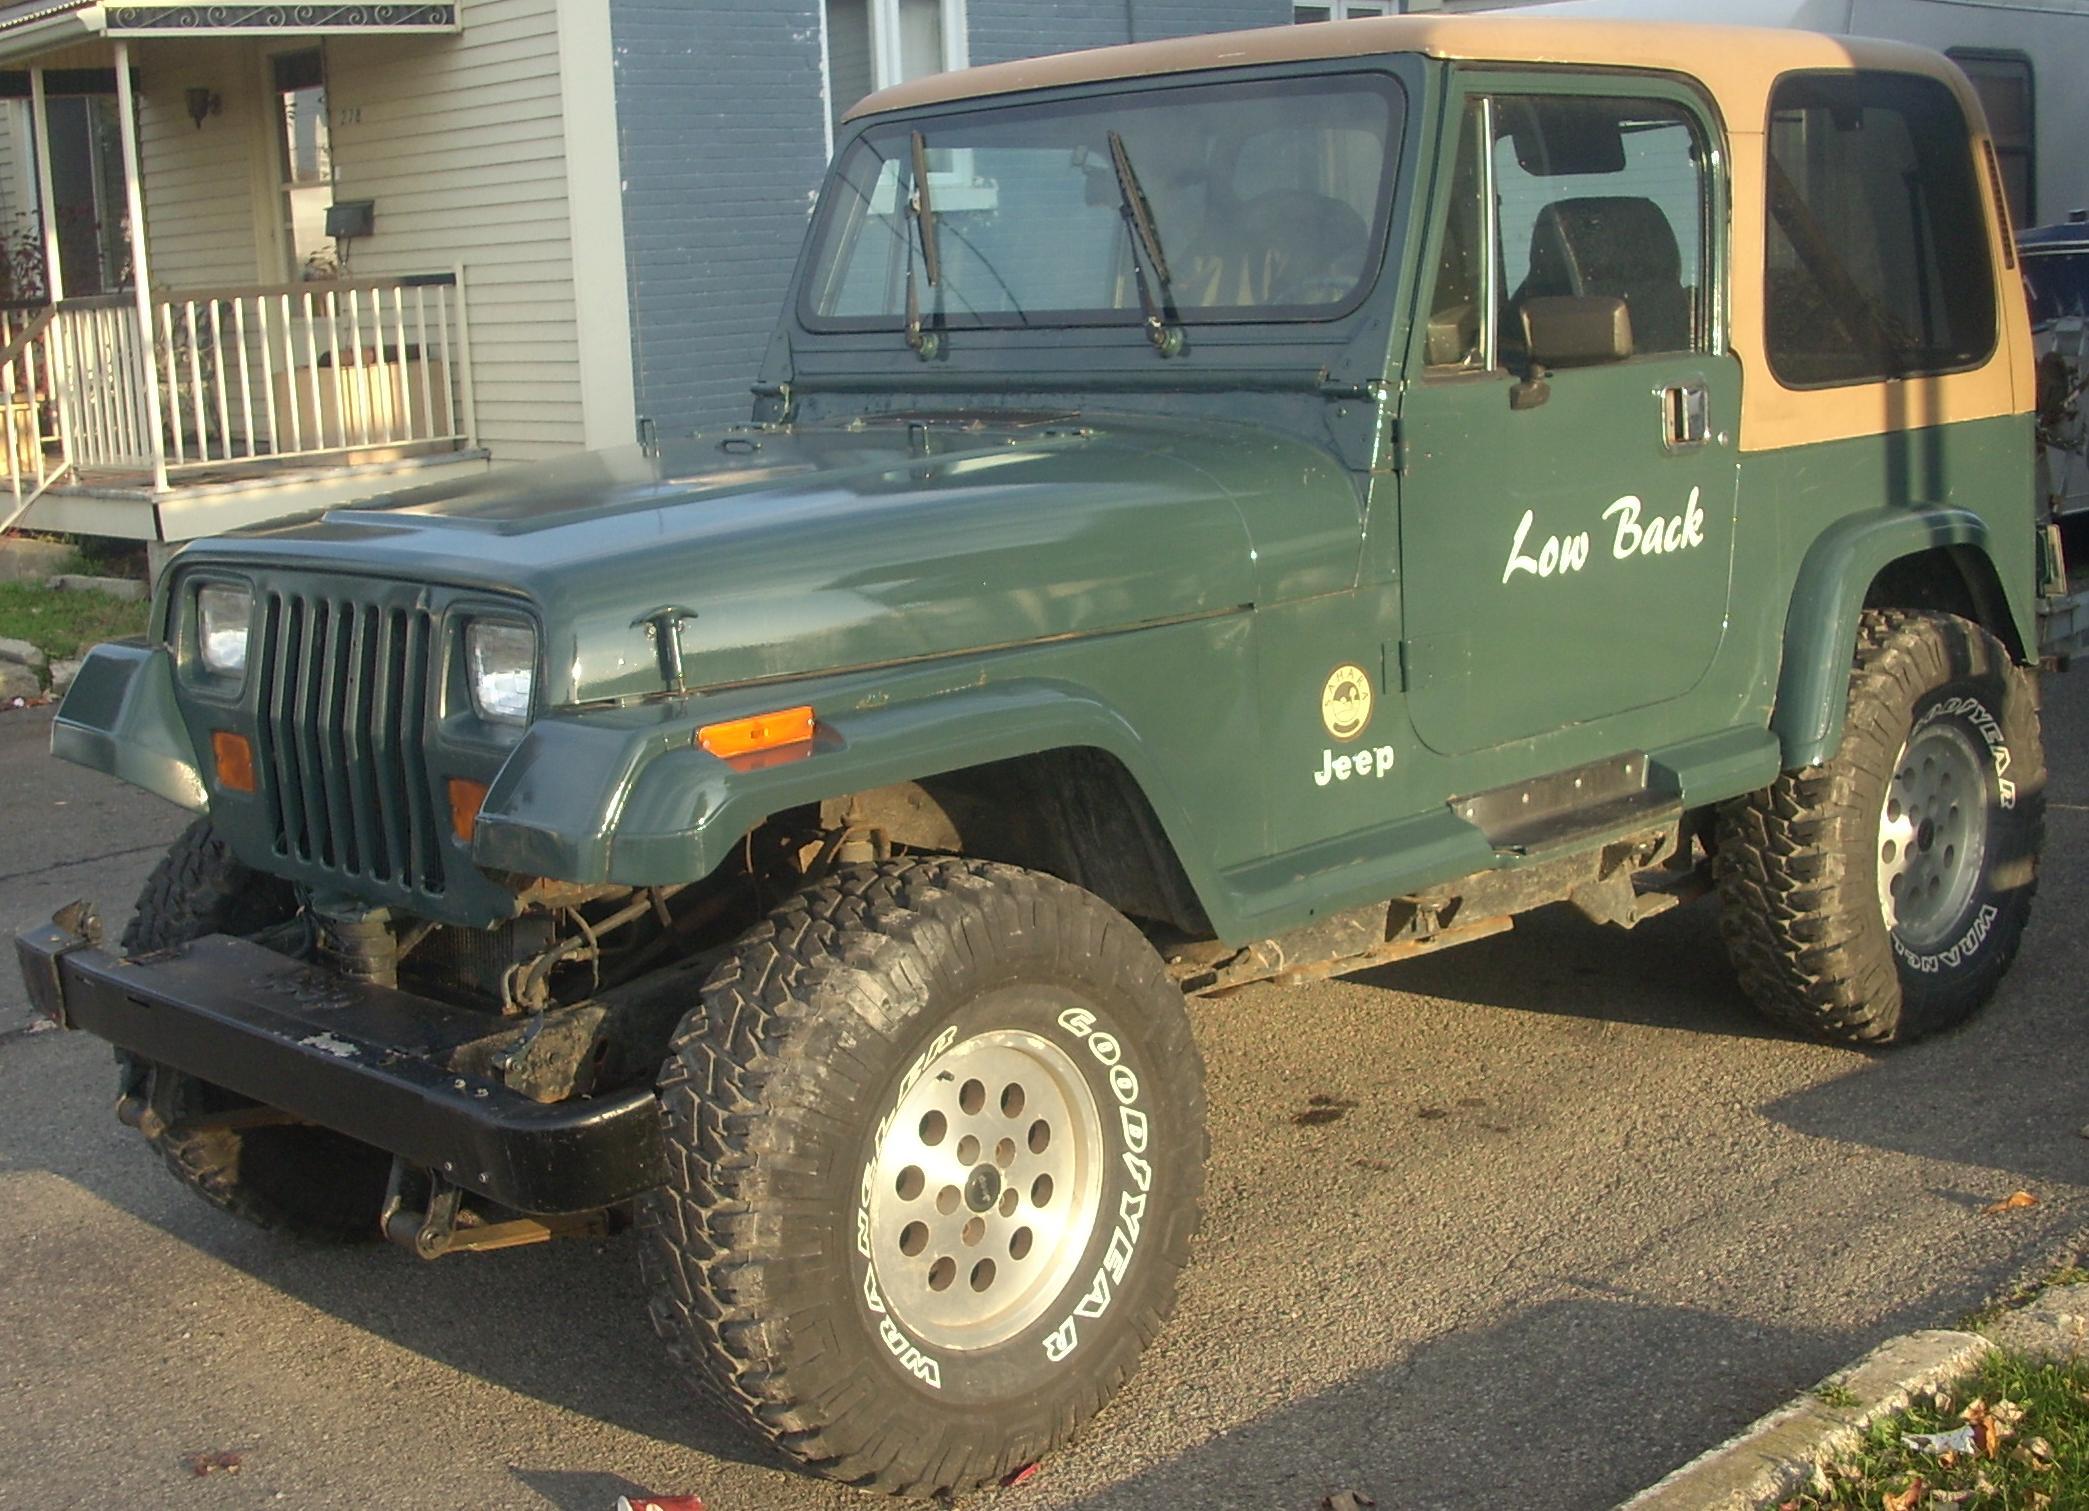 file jeep wrangler yj hardtop wikimedia mons Jeep Wrangler Unlimited Slanted Hard Top file jeep wrangler yj hardtop